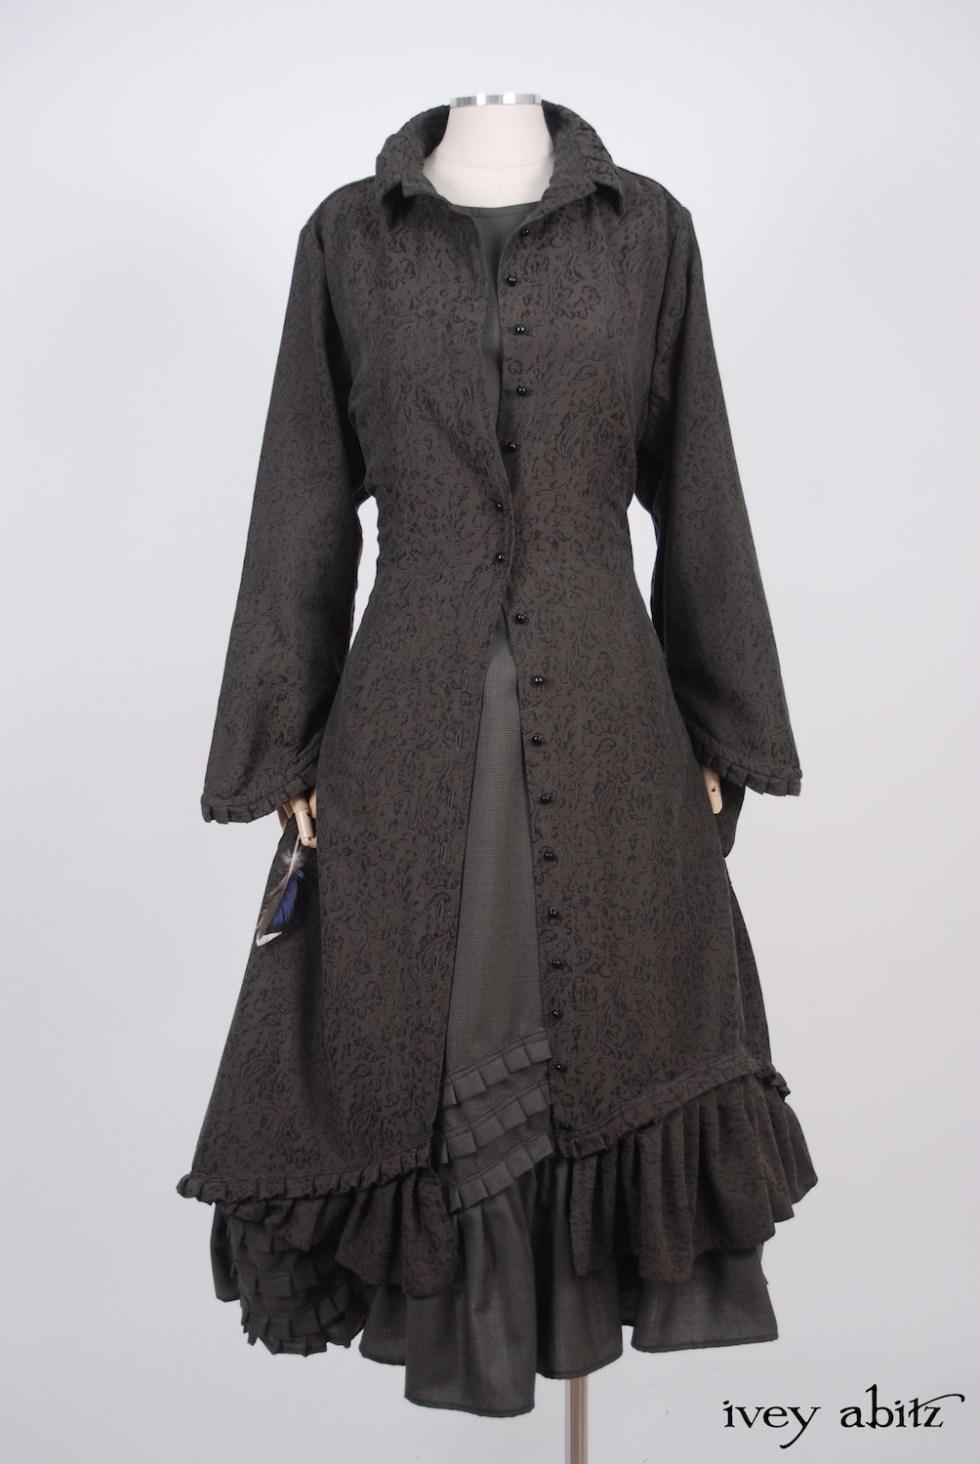 Ivey Abitz - Wilhemena Duster Coat in Moonlit Meadow Vine Weave  - Windrush Frock in Moonlit Meadow Houndstooth, High Water Length